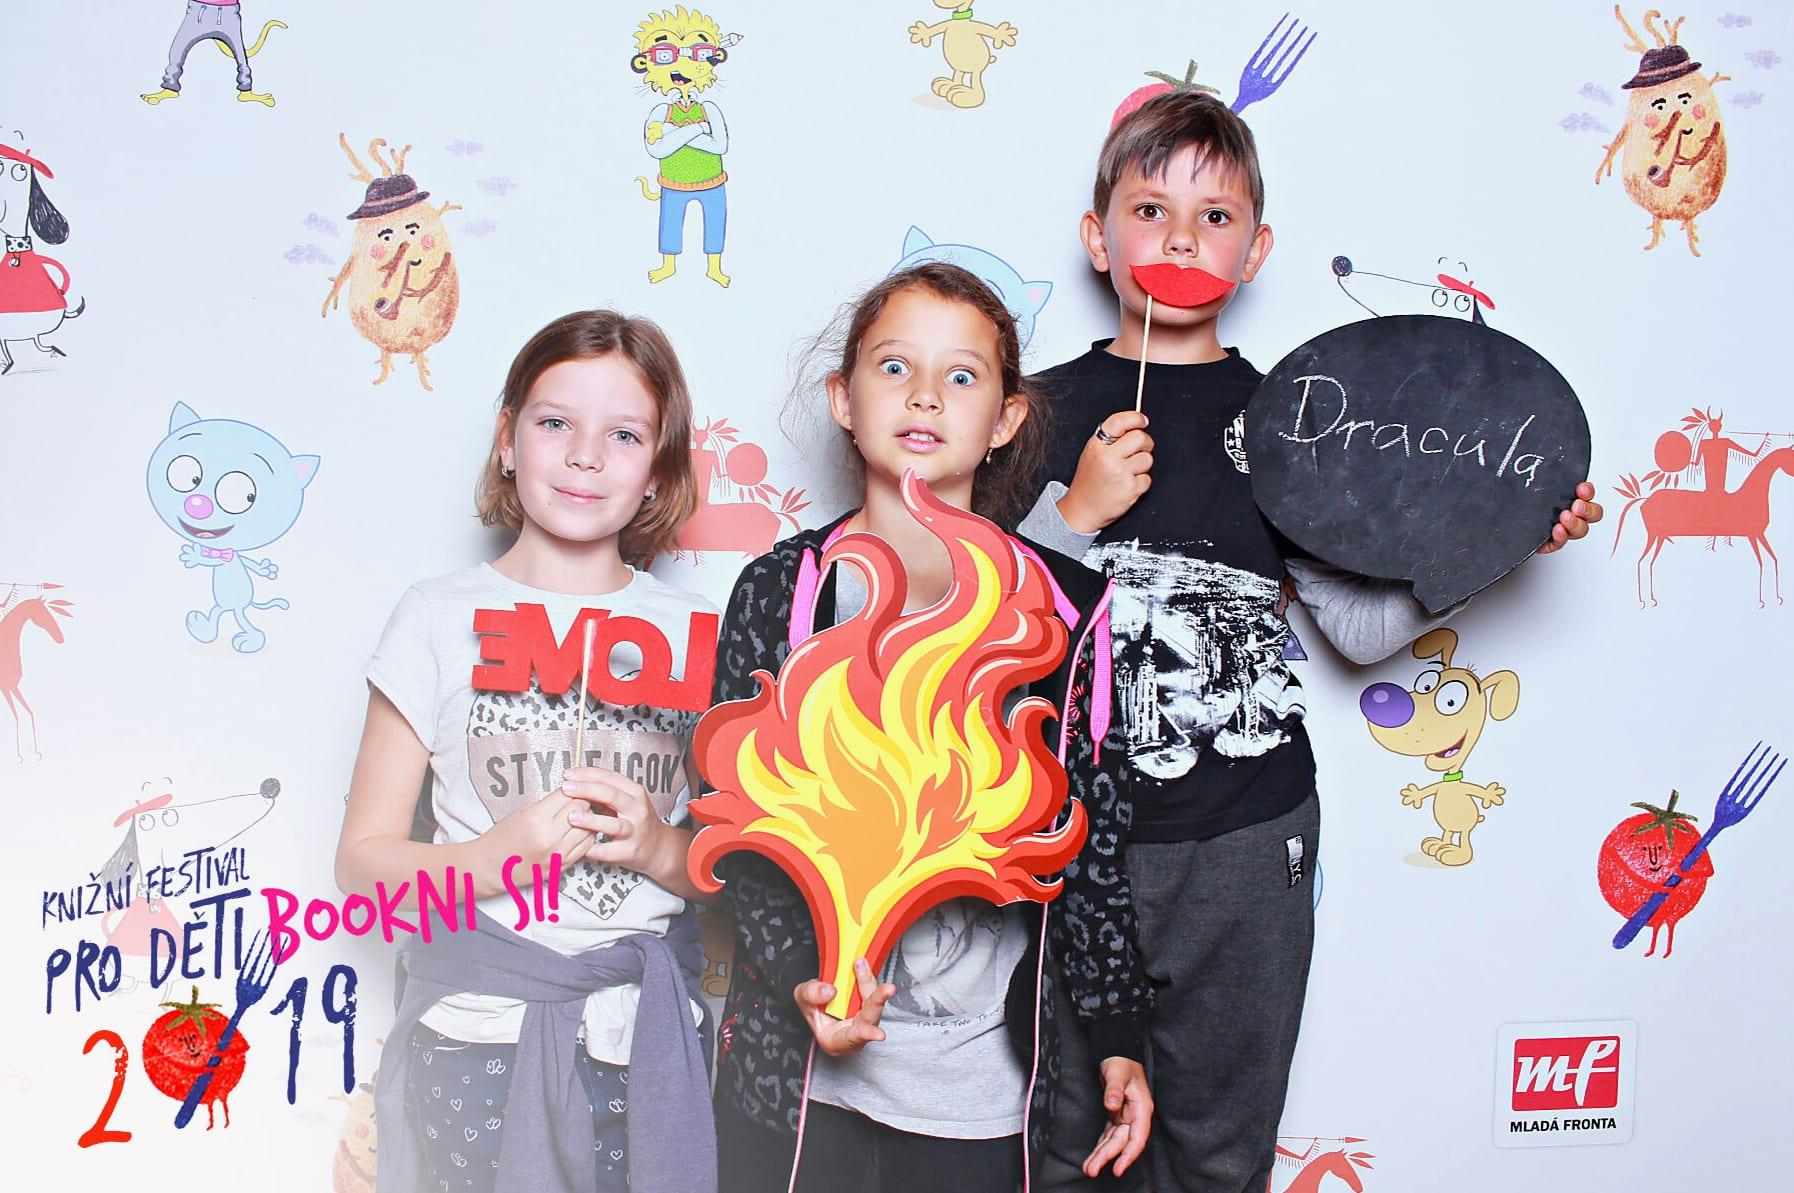 fotokoutek-festival-praha-bookni-si-17-9-2019-652571